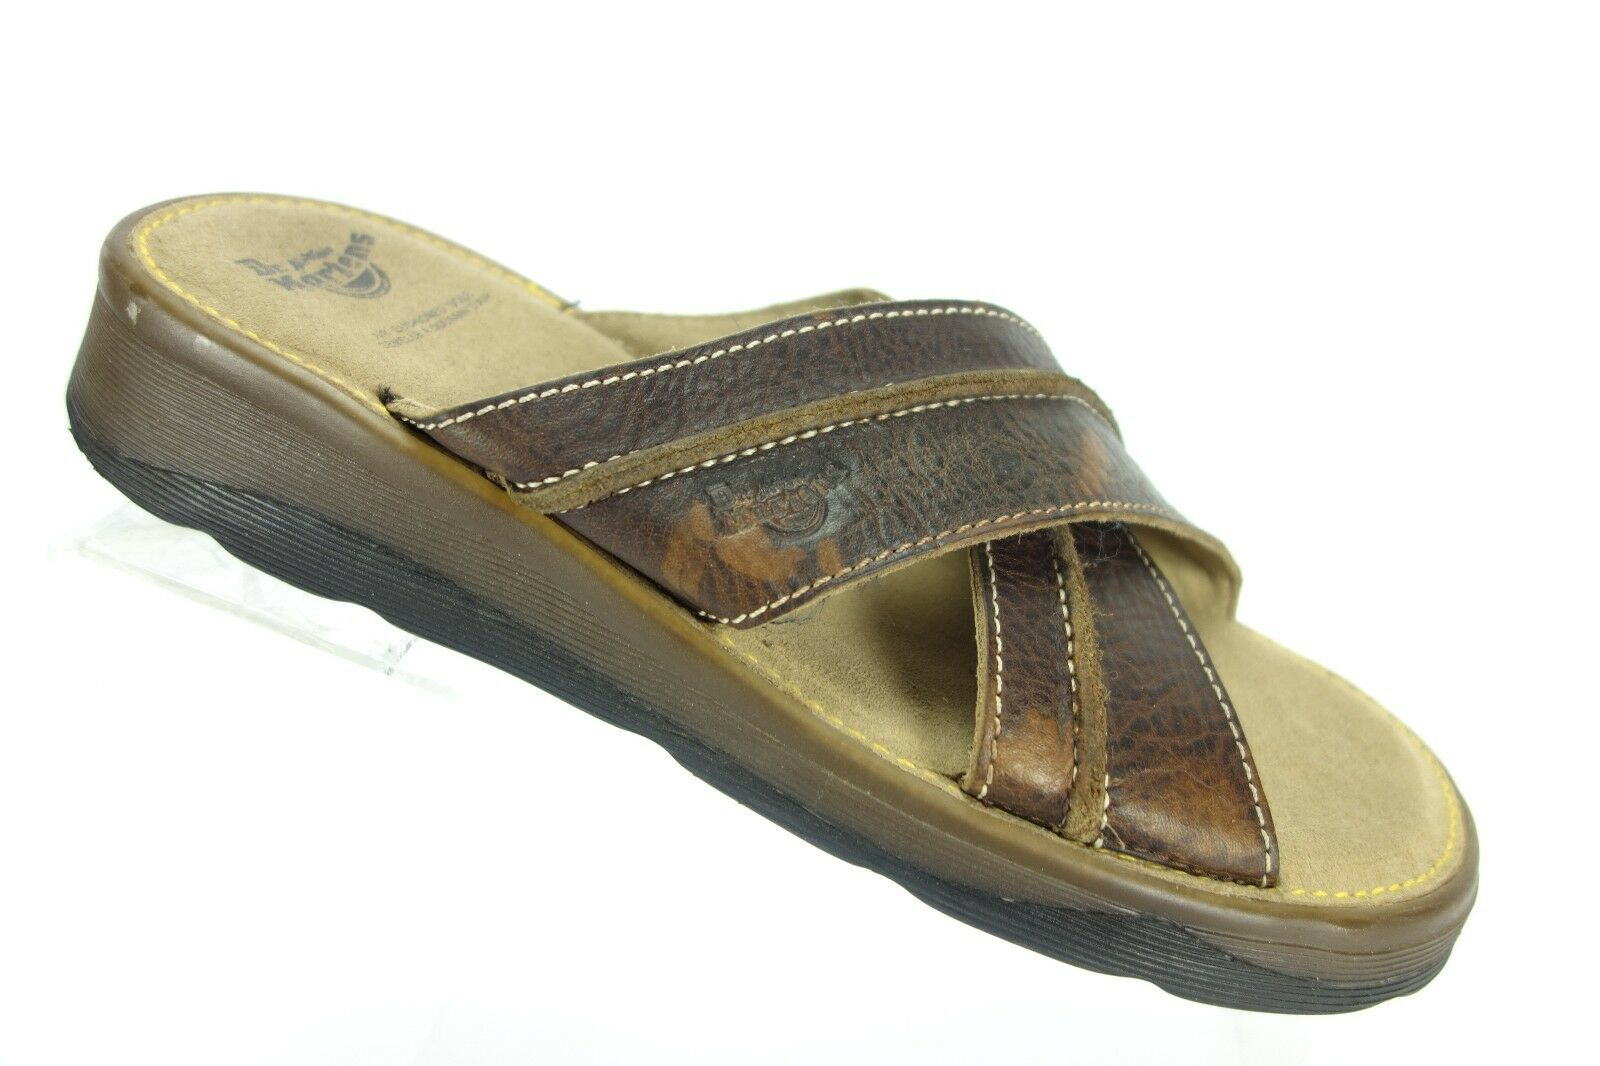 DR. Doc Martens Brown Leather X Strap OpenToe Sandal Flip Flop Slides Mens Sze 8